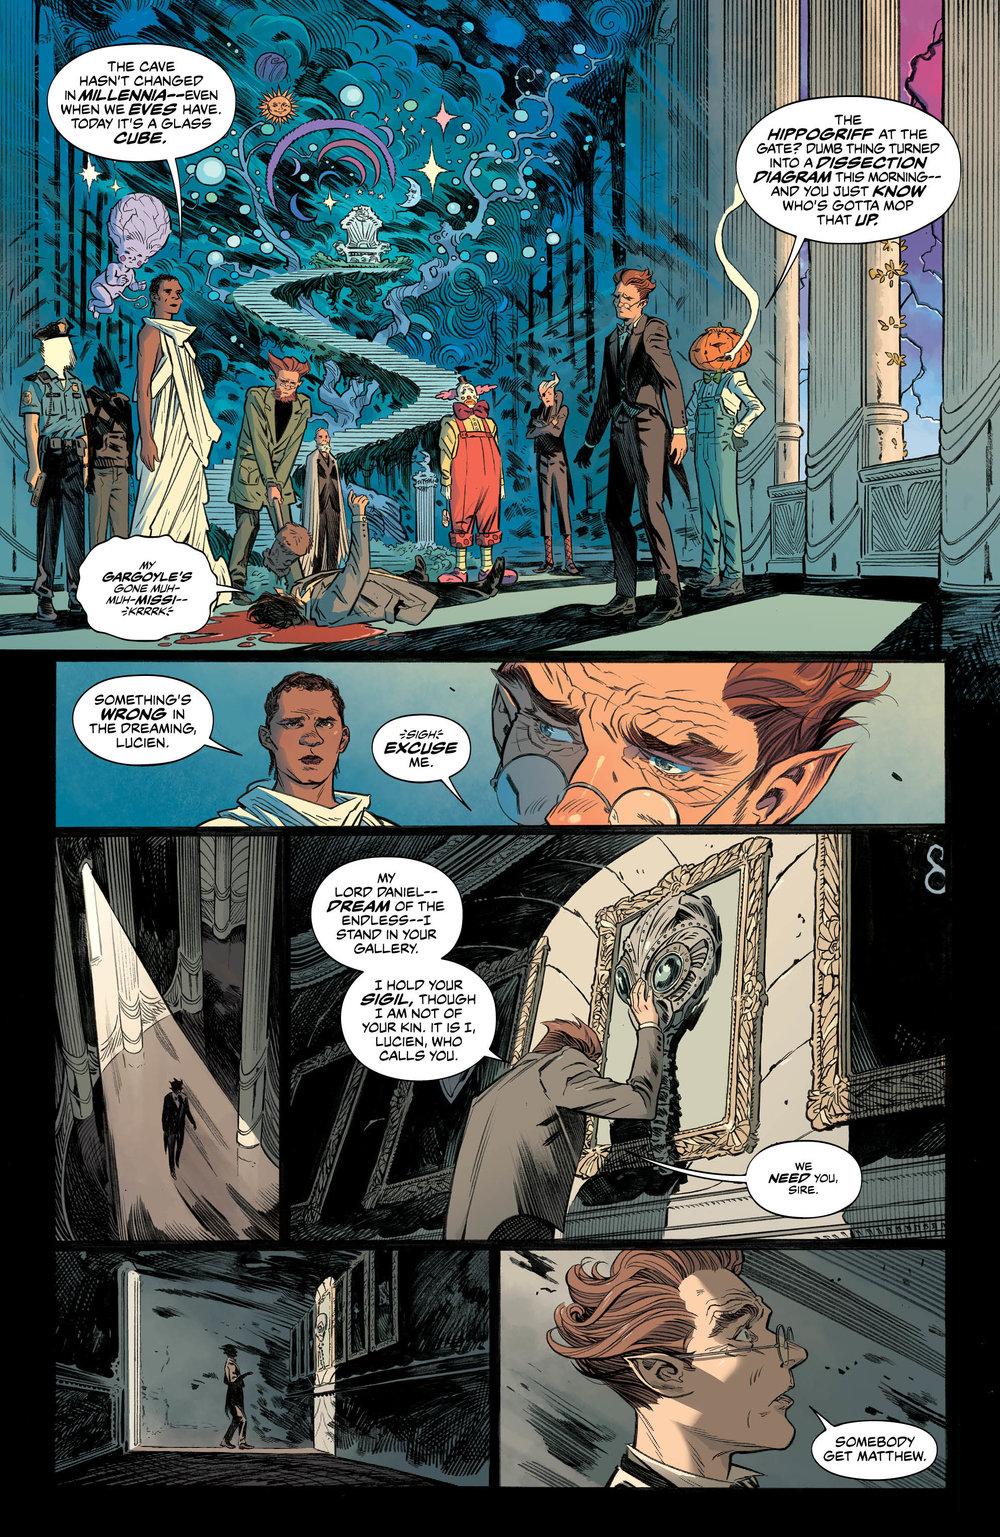 Image courtesy DC Comics